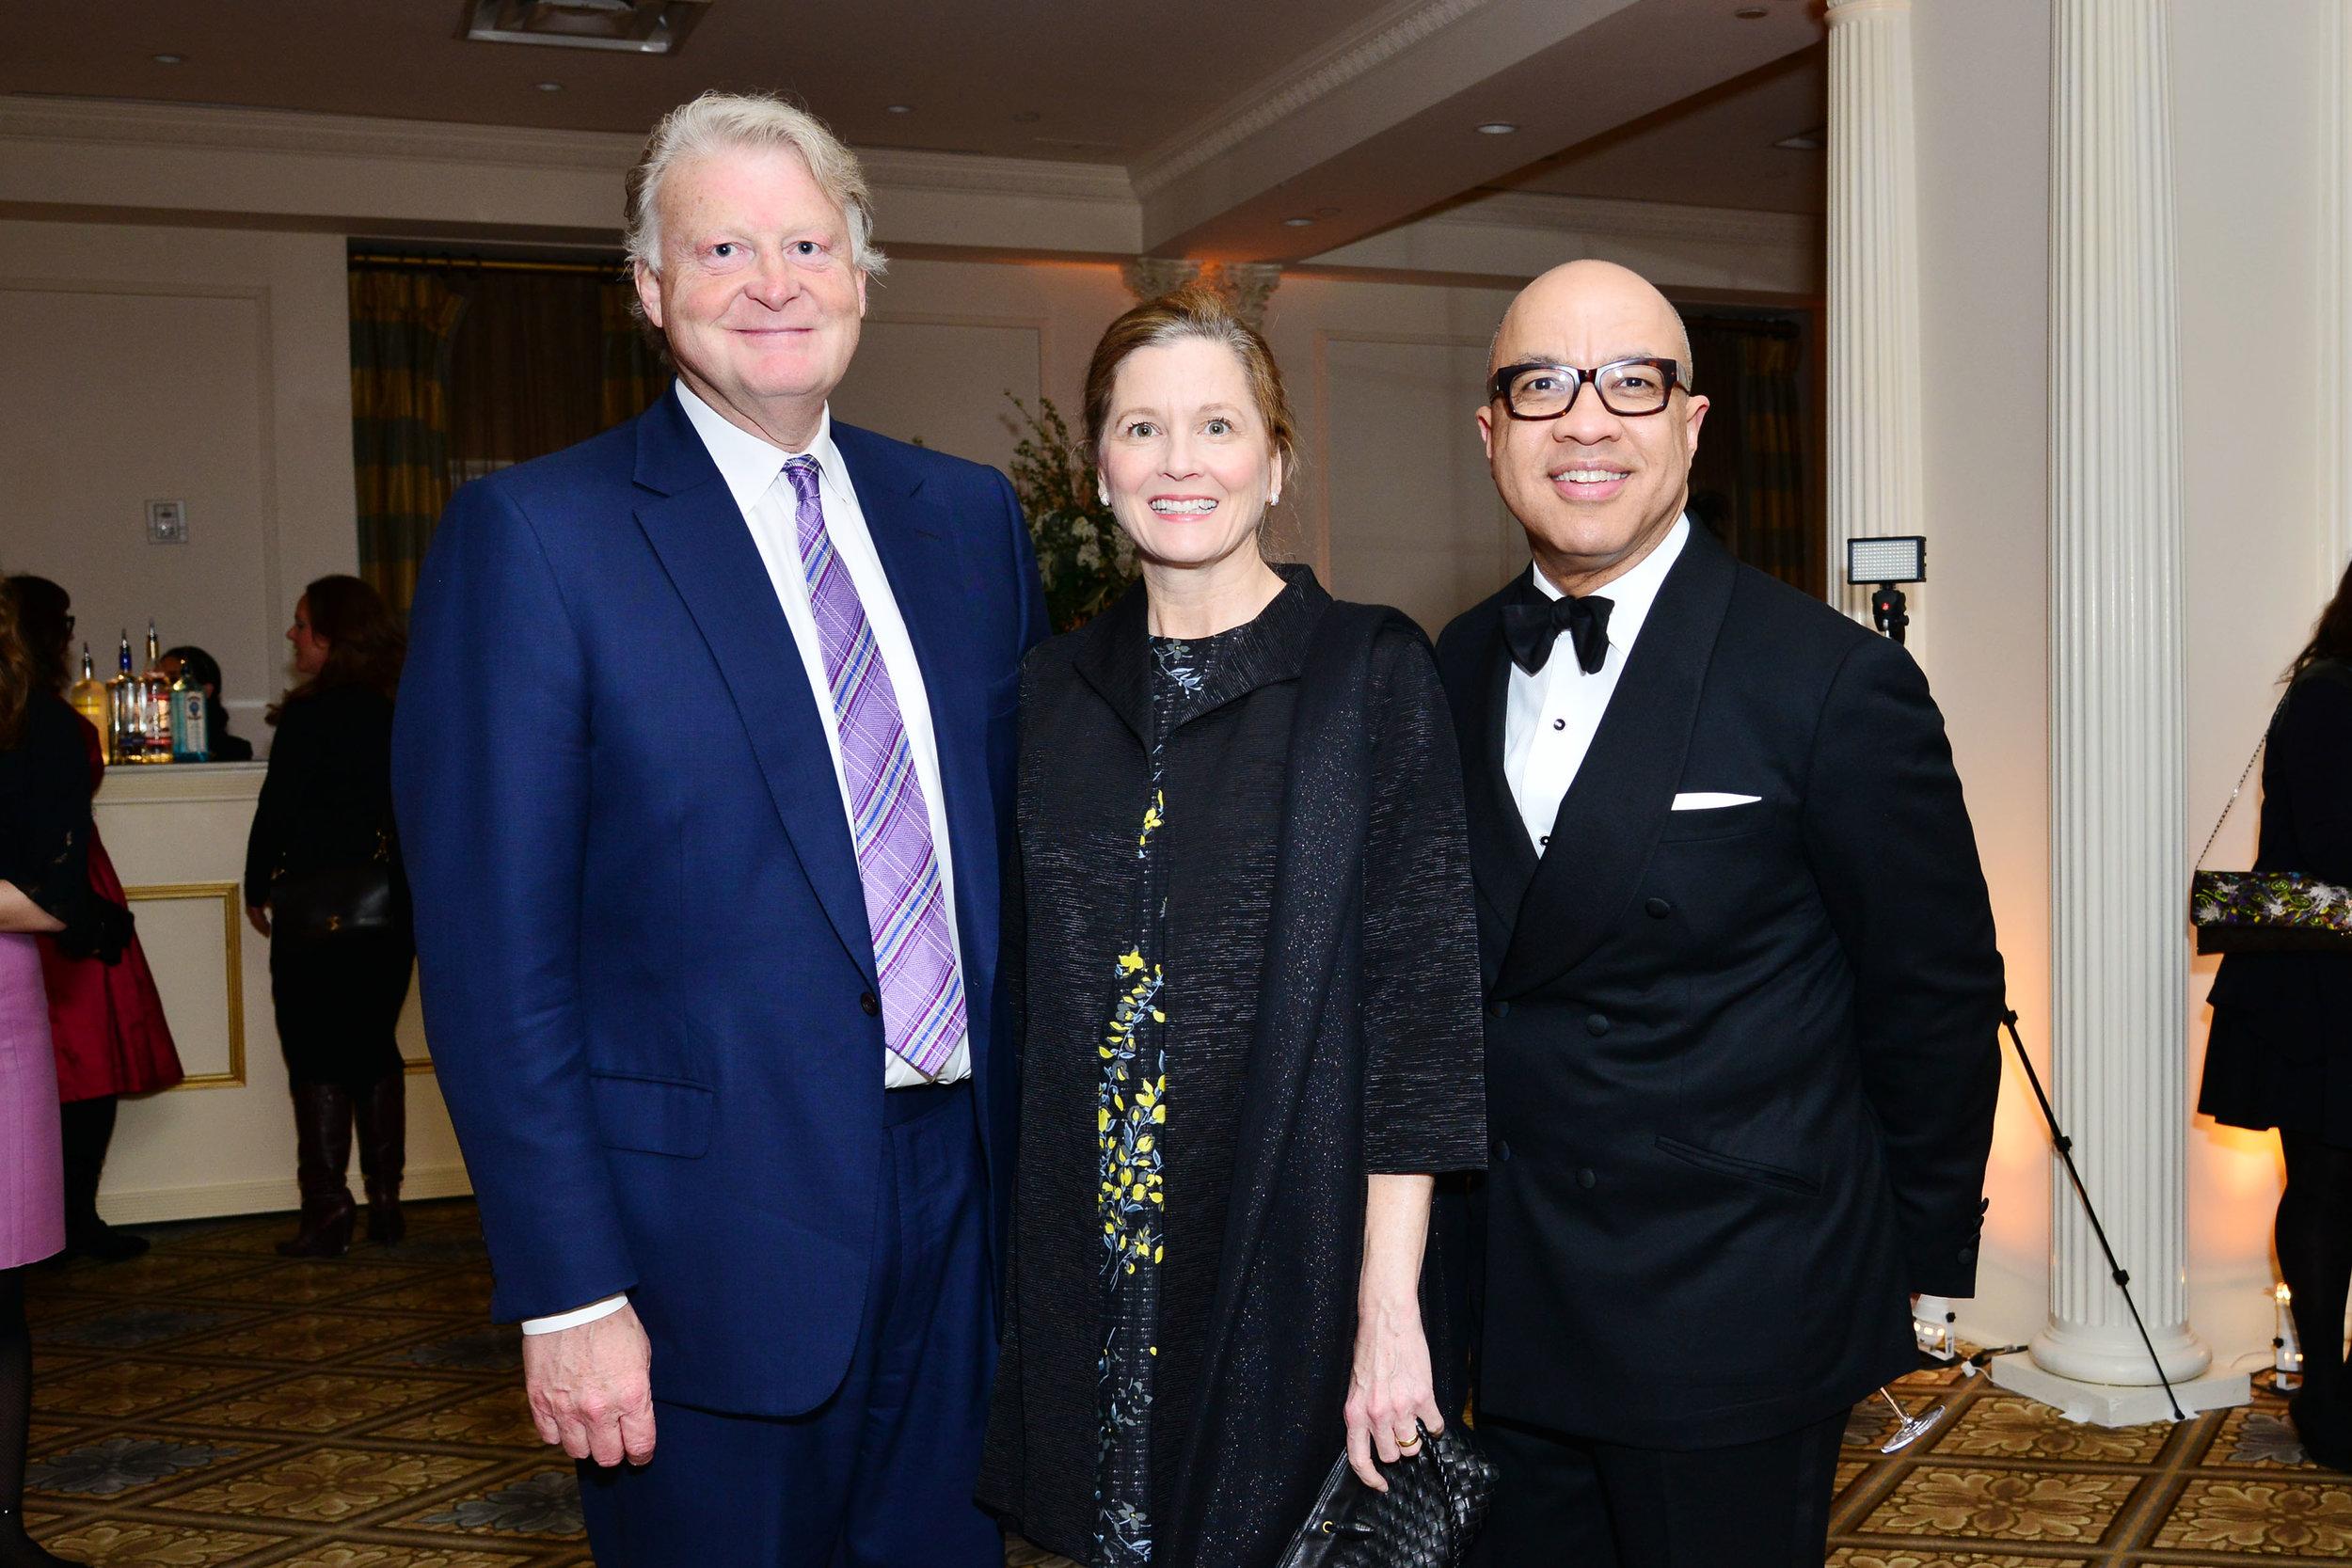 Edward Dolman, Samantha Gilbert, Darren Walker==Skowhegan 70th Anniversary Celebration & 2016 Awards Dinner== The Plaza, NYC==April 26, 2016==©Patrick McMullan==Photo – Jared Siskin/PMC==